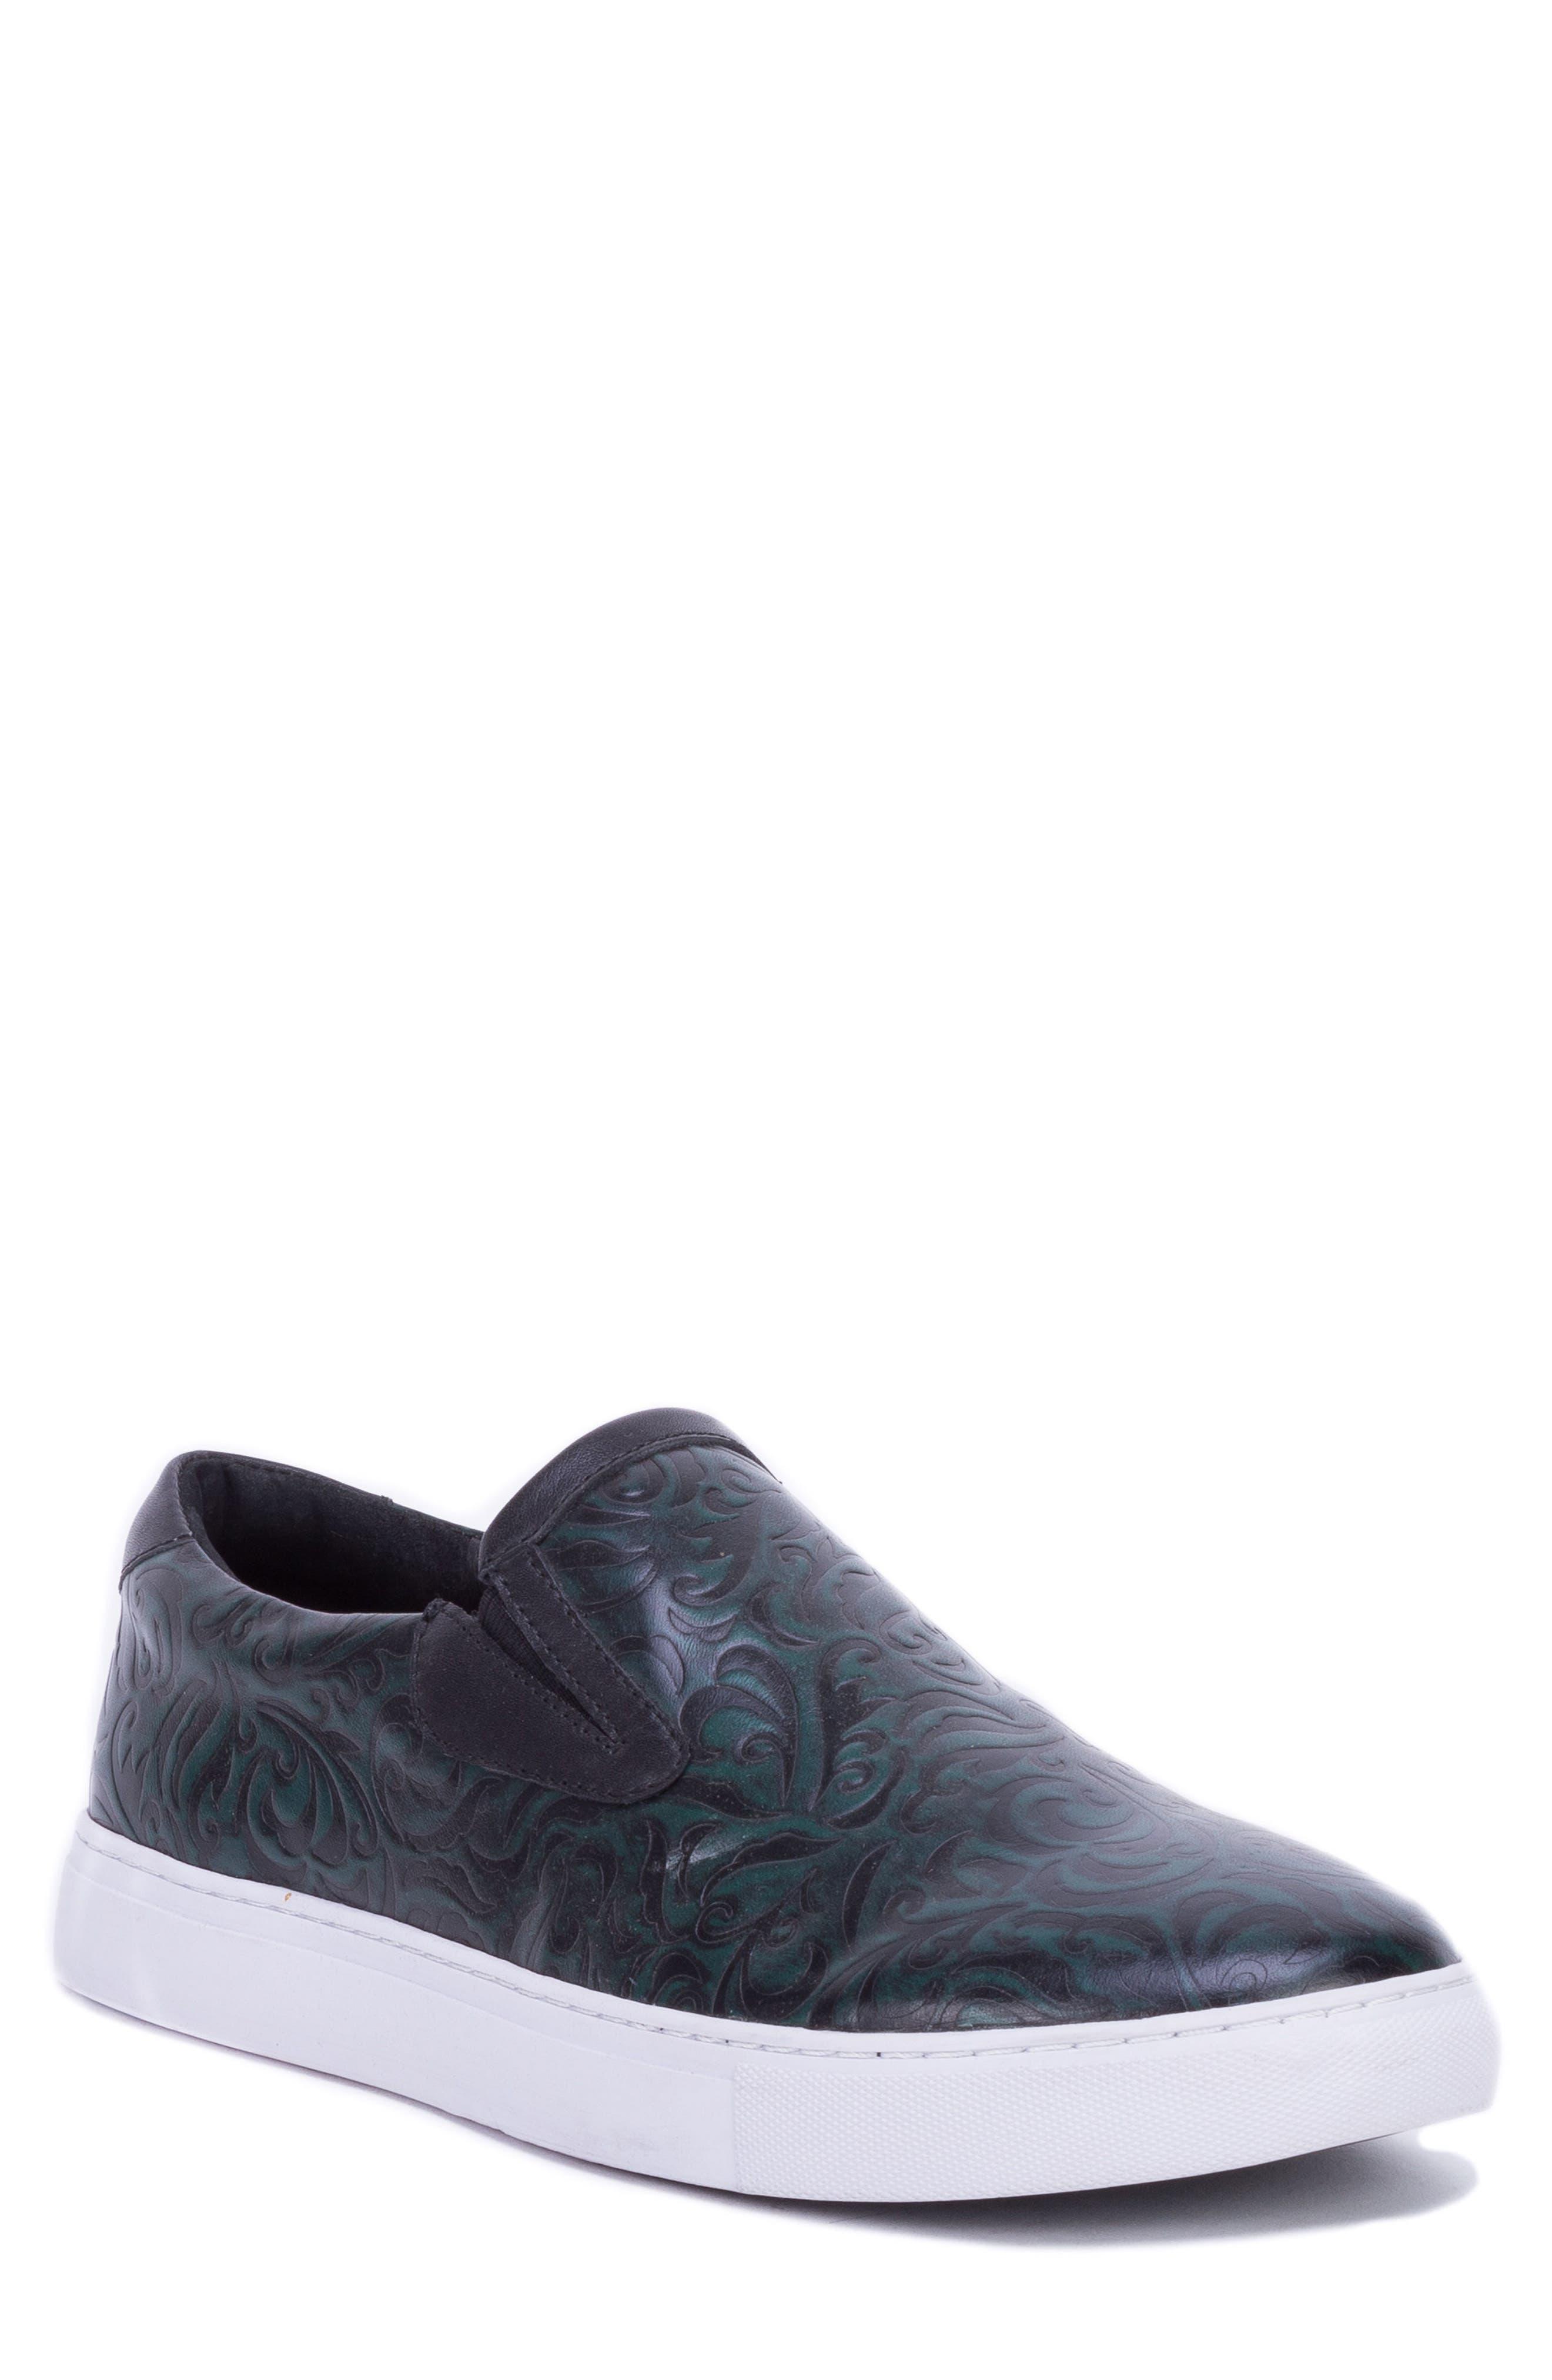 Lanning Slip-On Sneaker,                             Main thumbnail 1, color,                             GREEN LEATHER